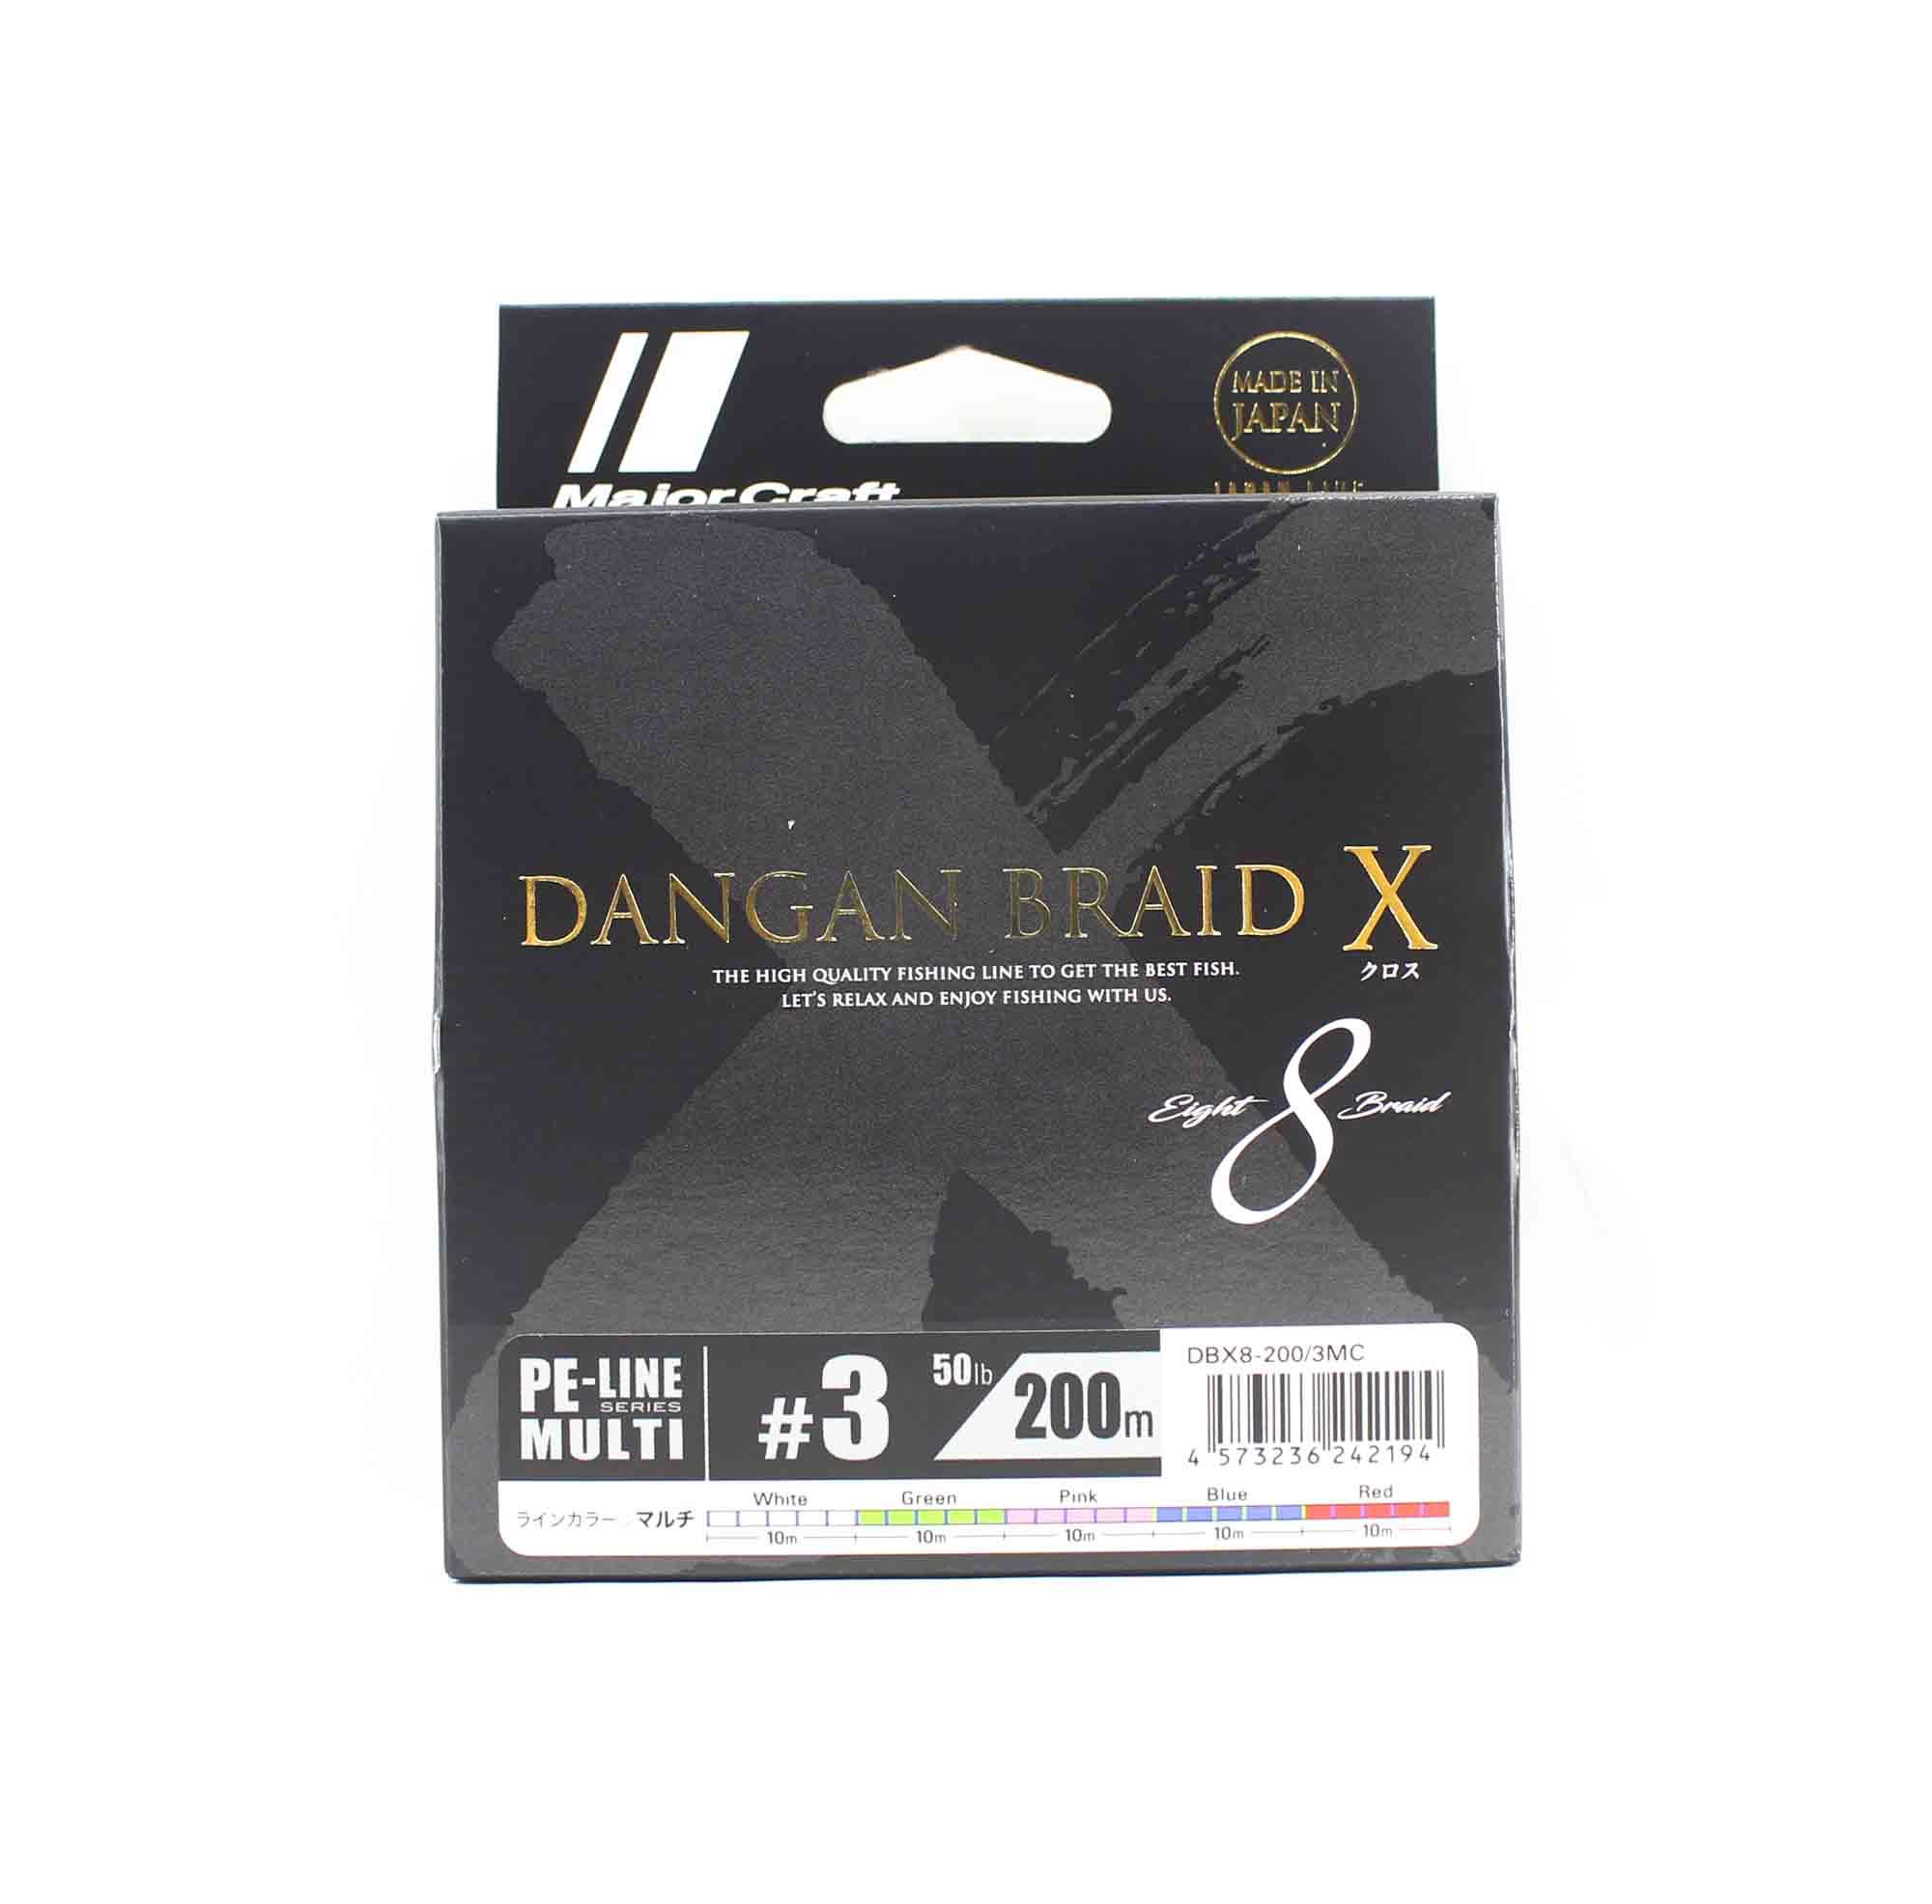 Major Craft Dangan Braid X Line X8 200m P.E 3 Multi DBX8-200/3MC (2194)